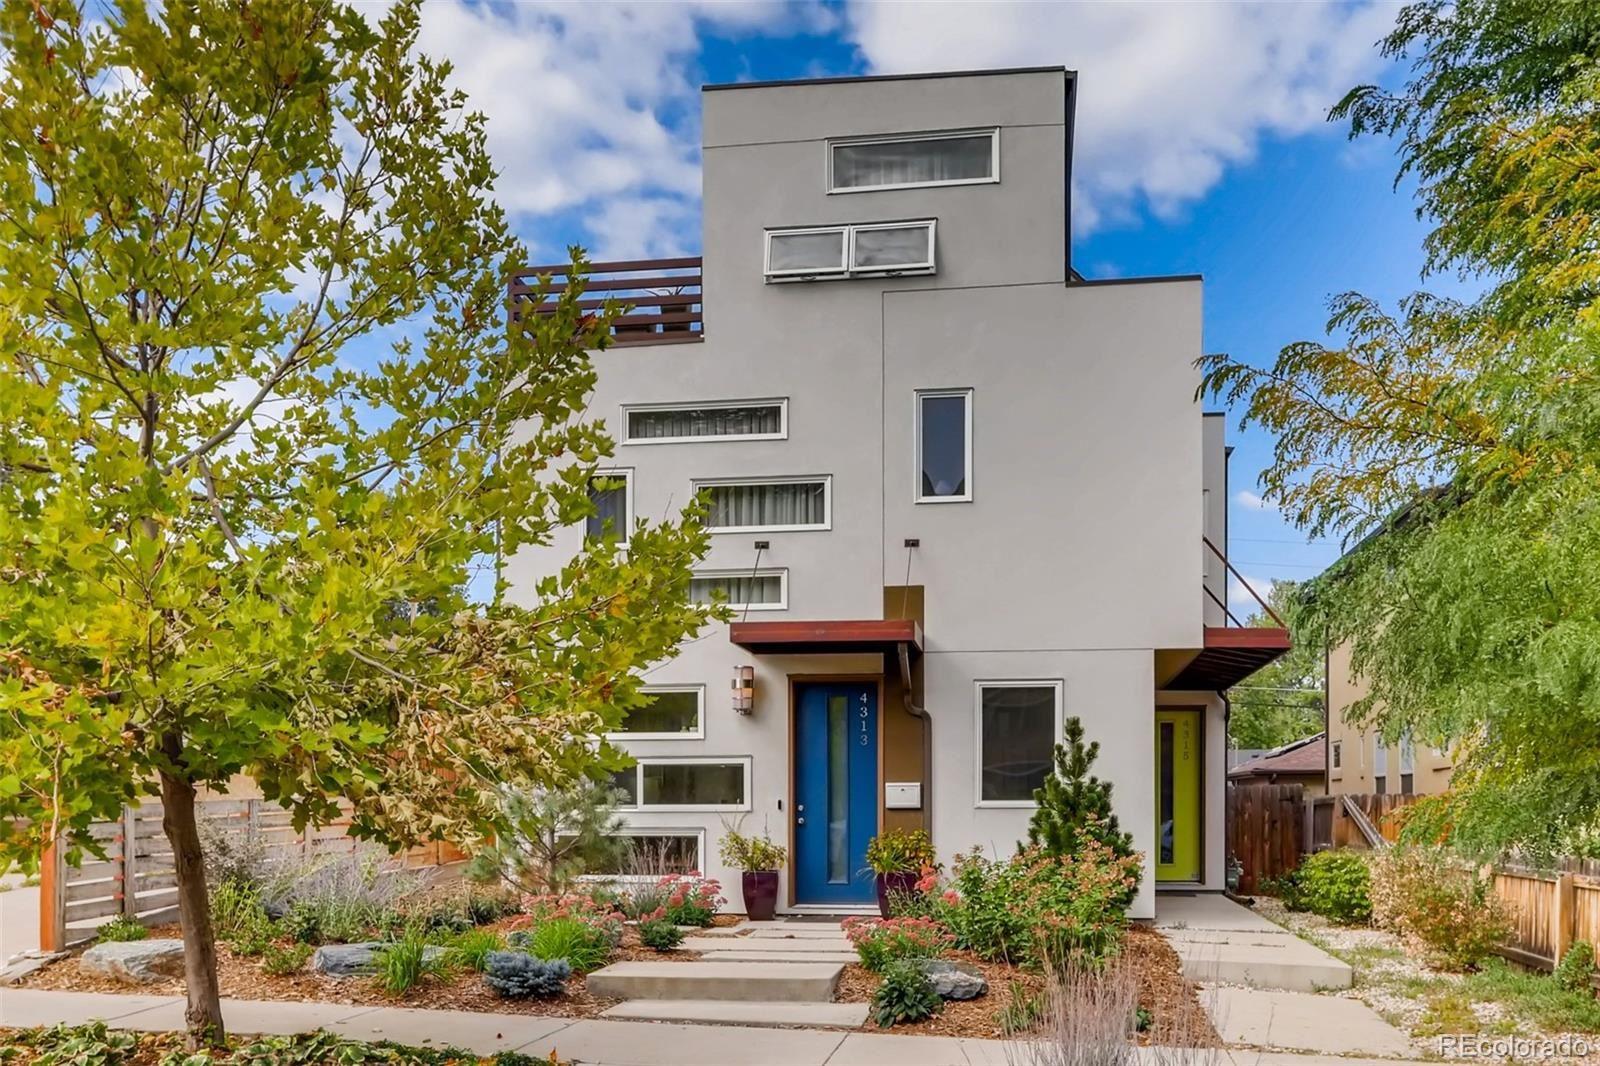 Photo of 4313 Vrain Street, Denver, CO 80212 (MLS # 1932600)